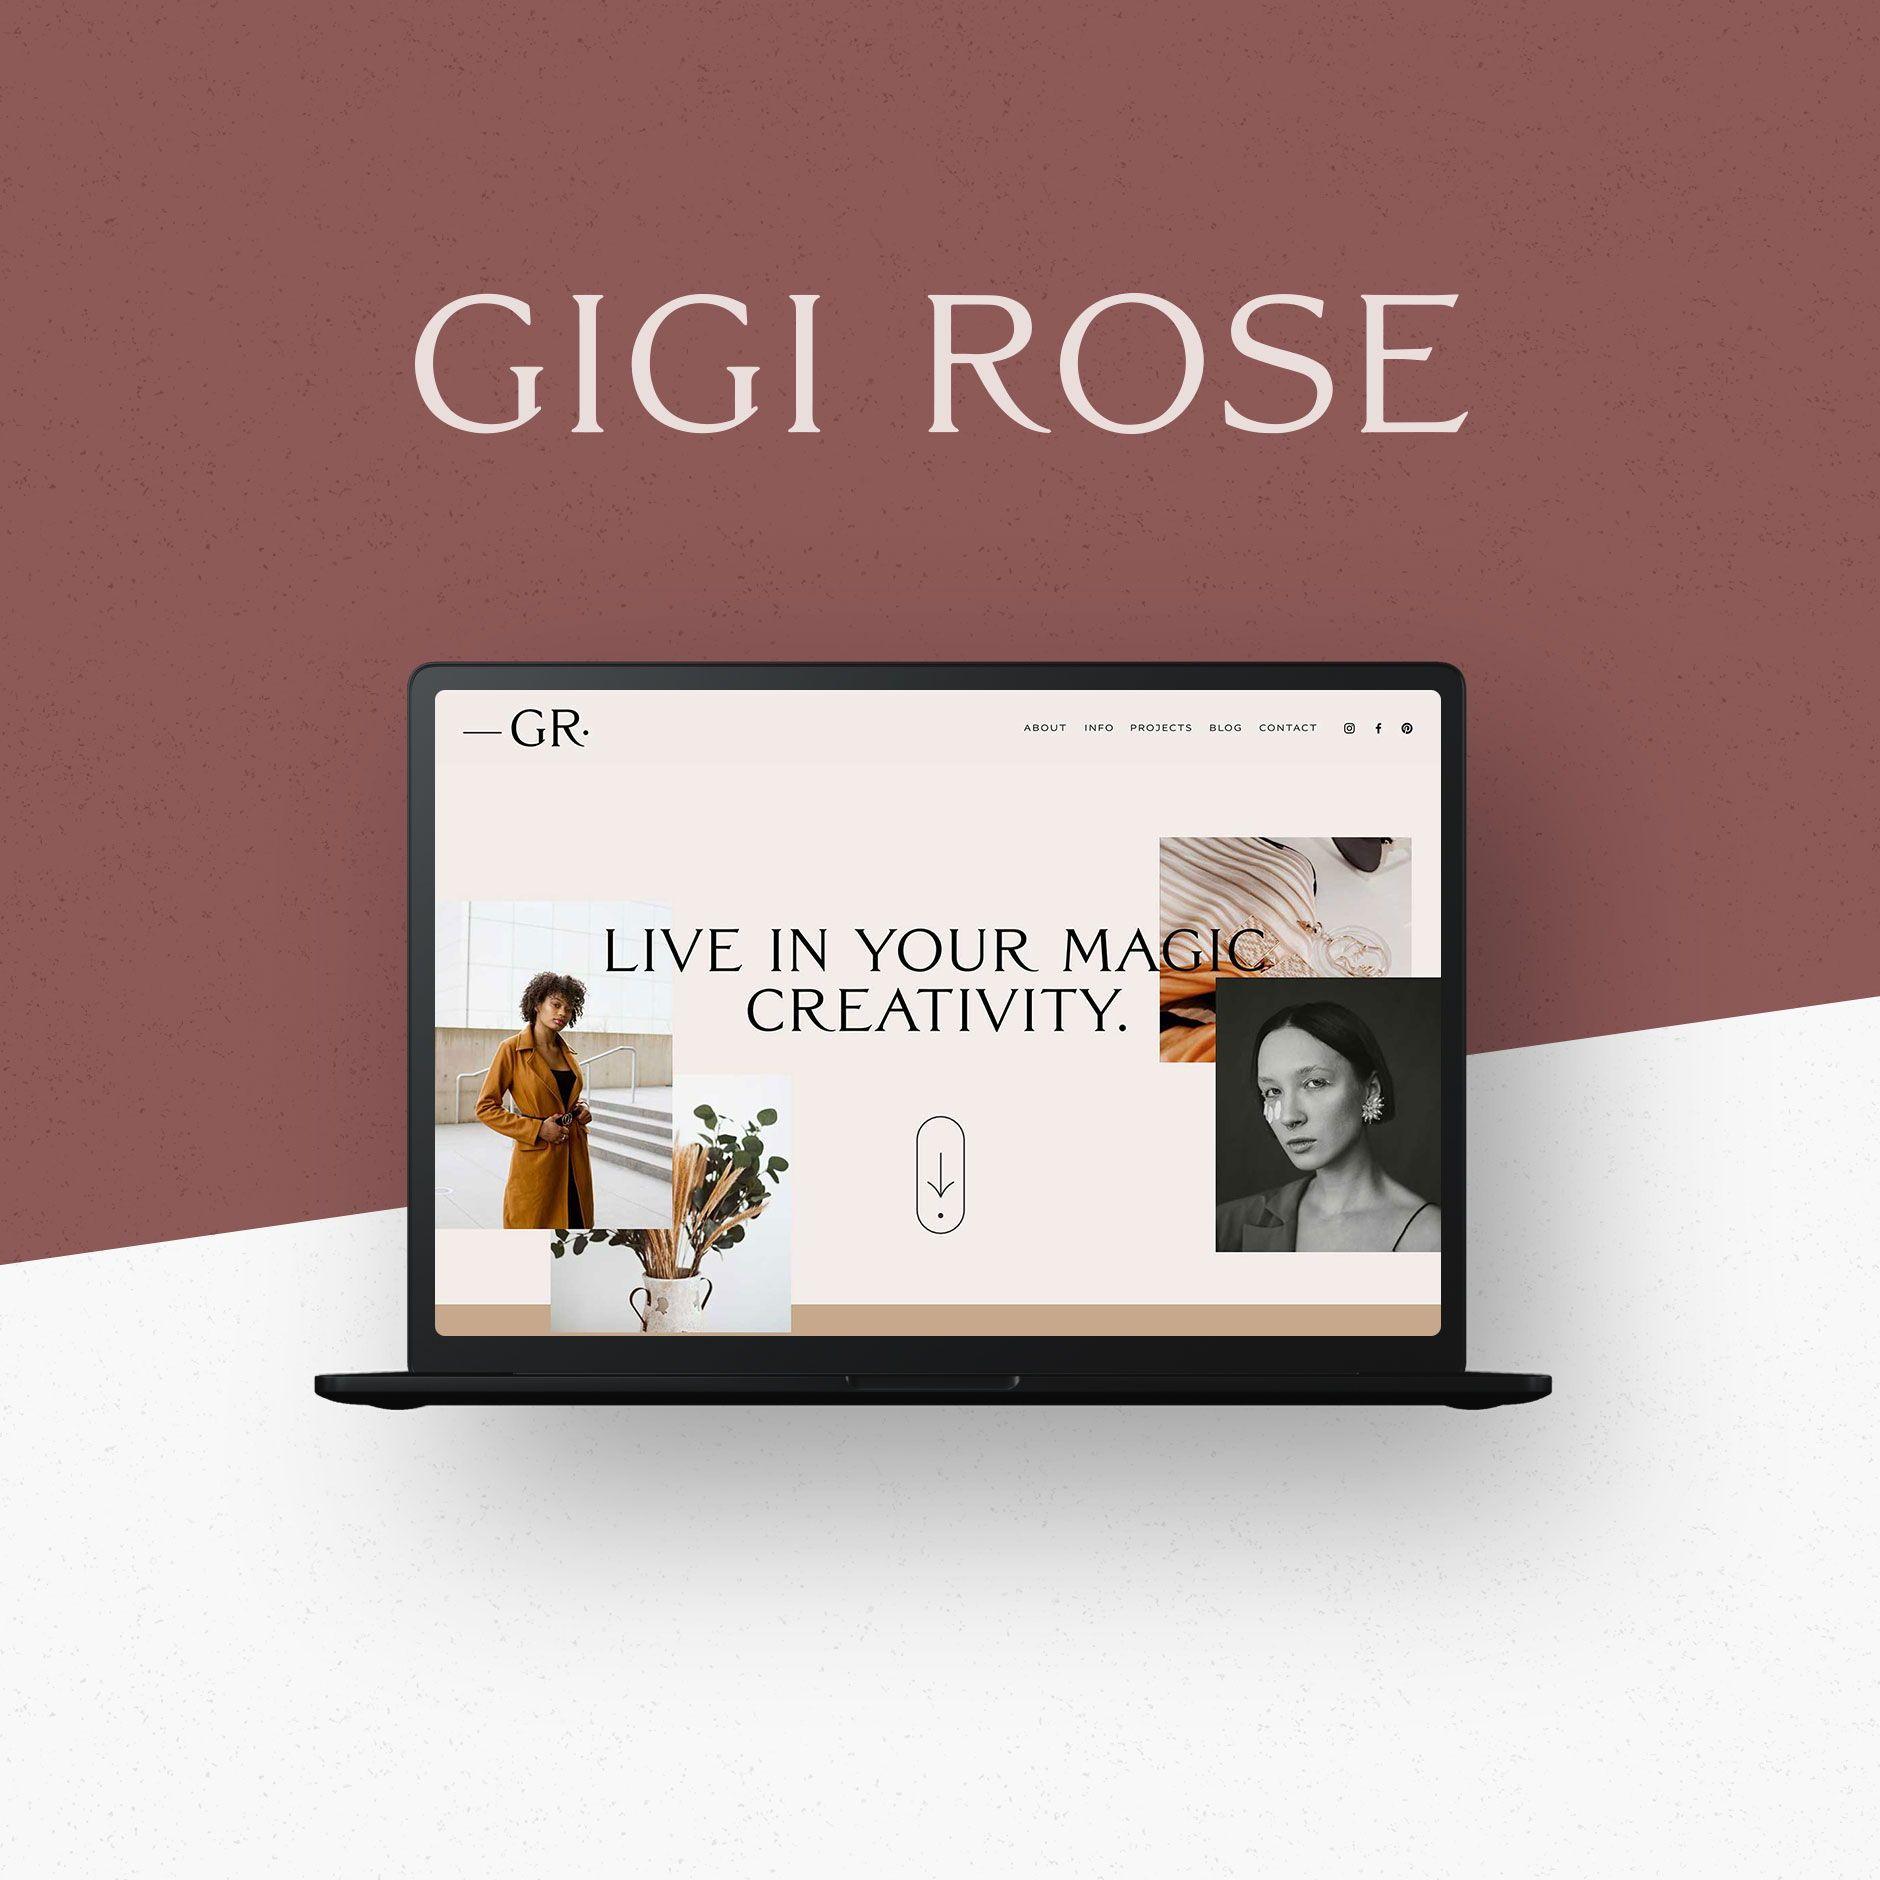 Gigi Rose Squarespace 7 1 Template Kit Big Cat Creative Squarespace Templates Squarespace Templates Squarespace Diy Web Design